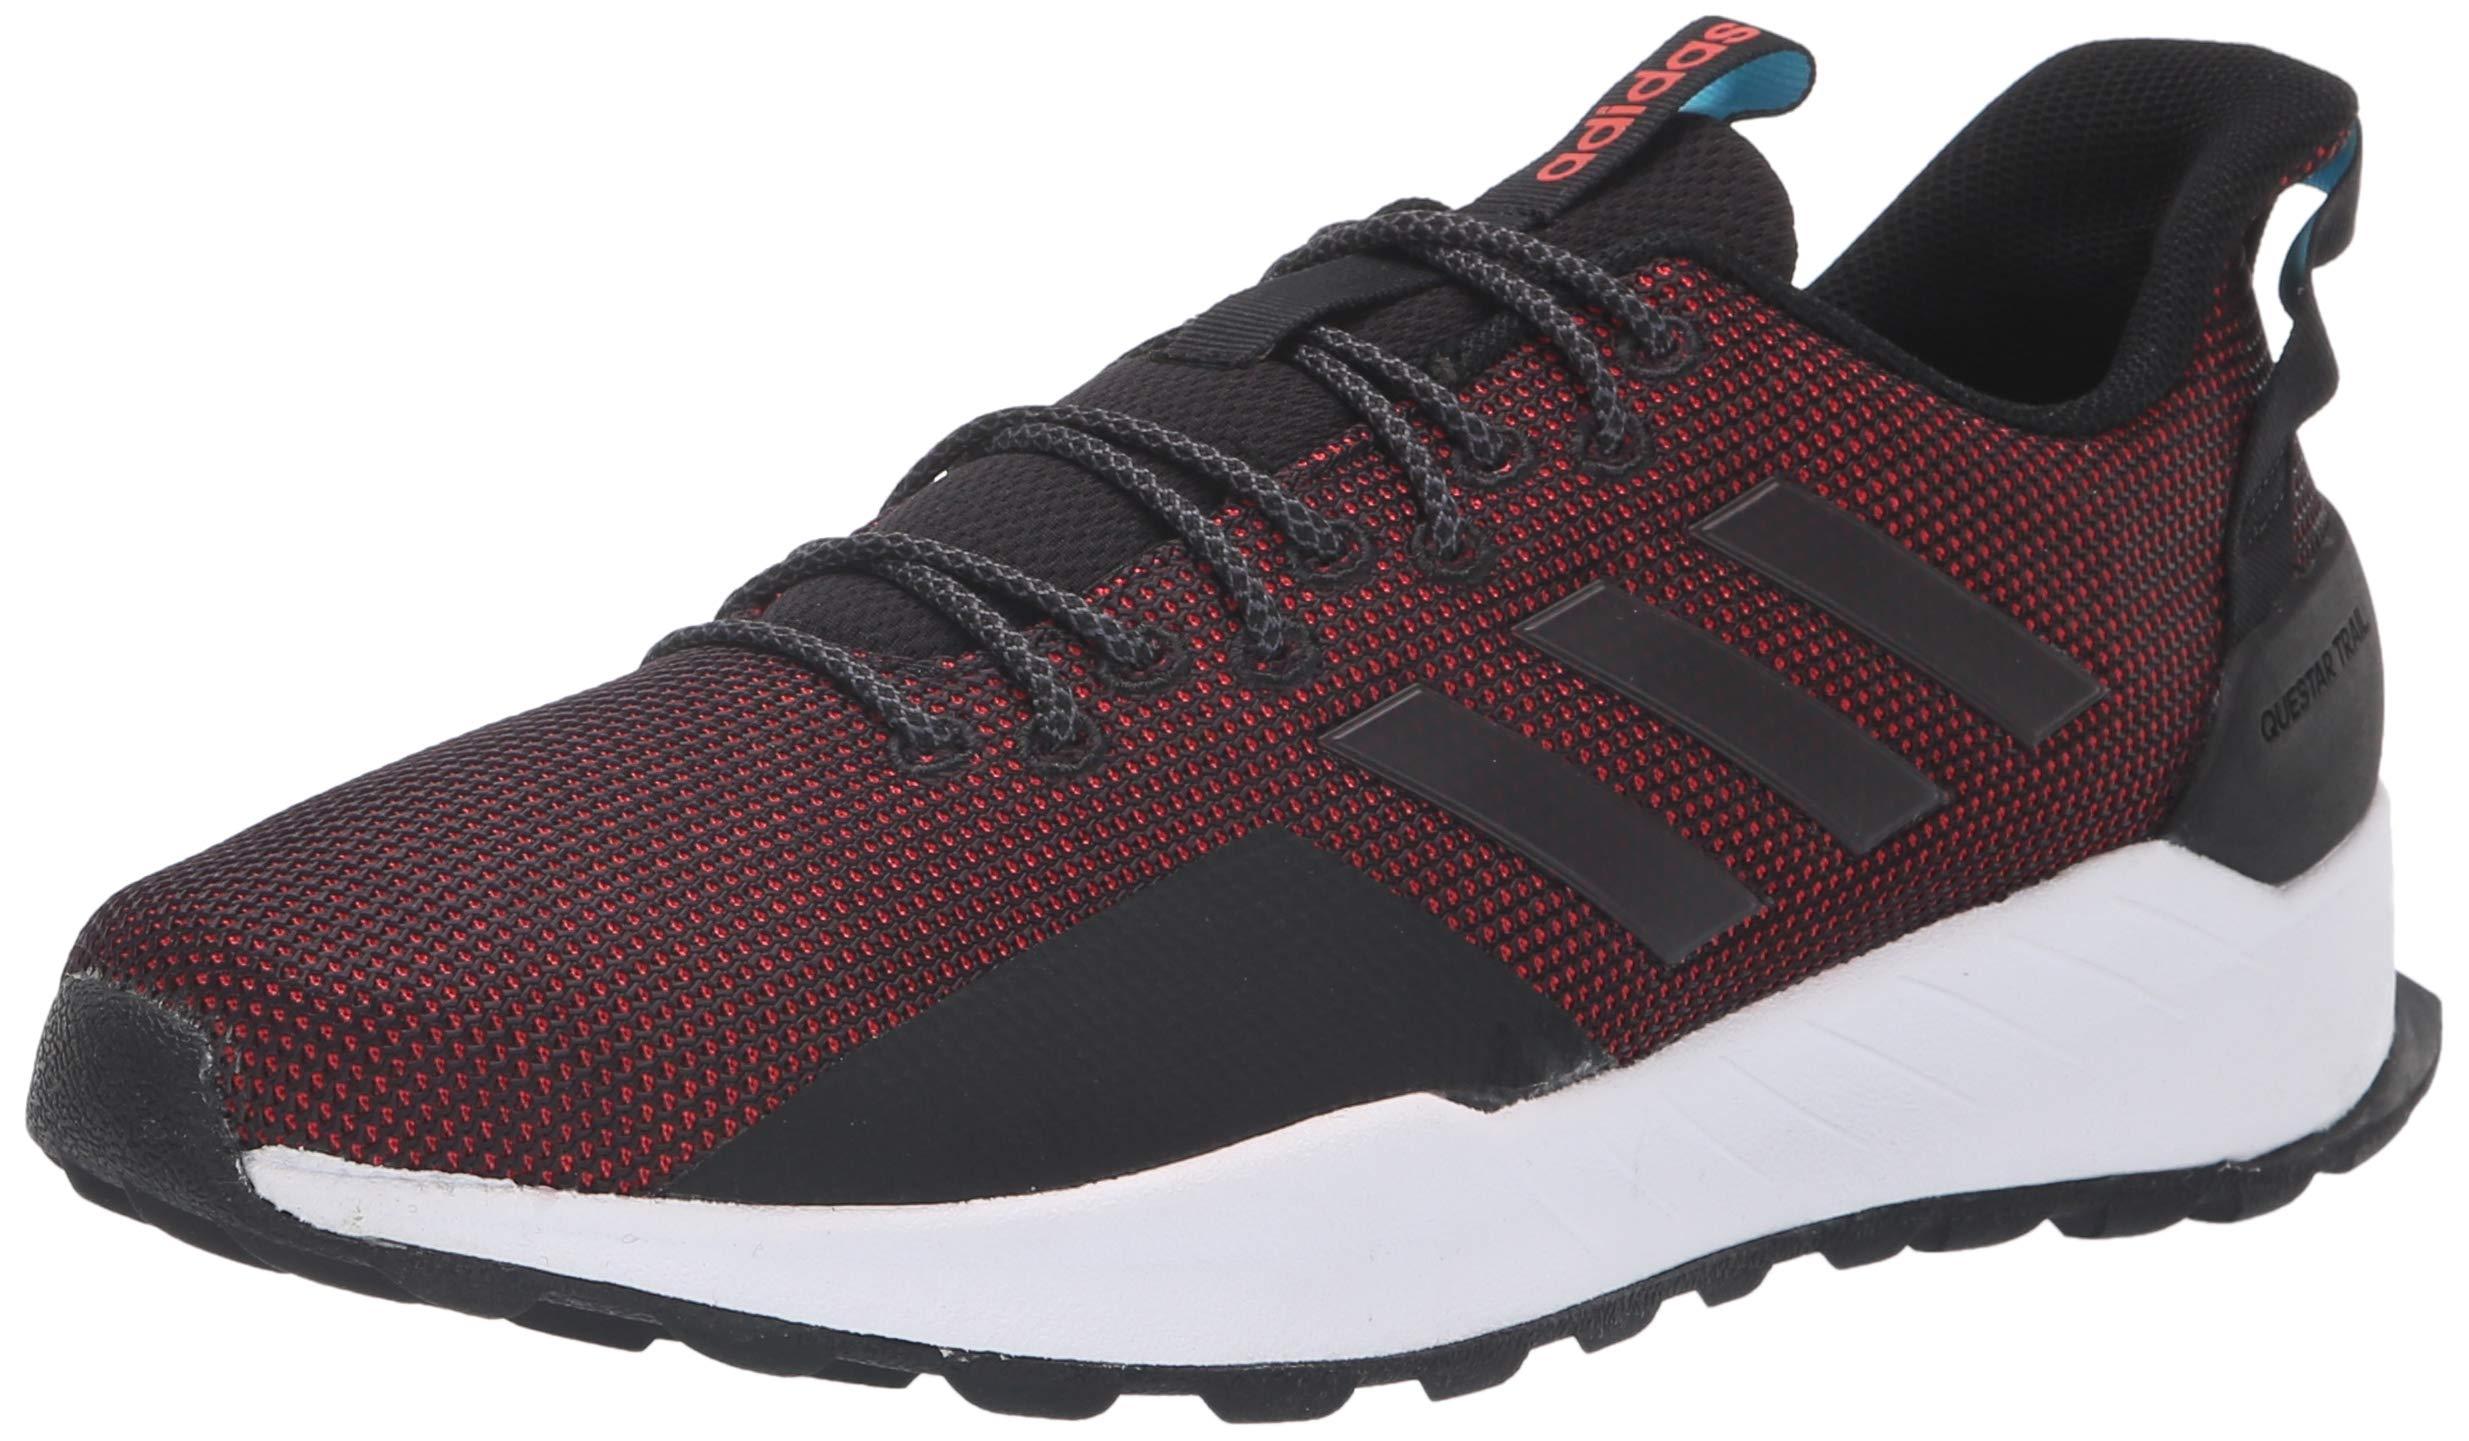 adidas Men's Questar Trail Running Shoe, Black/hi-res red, 10 M US